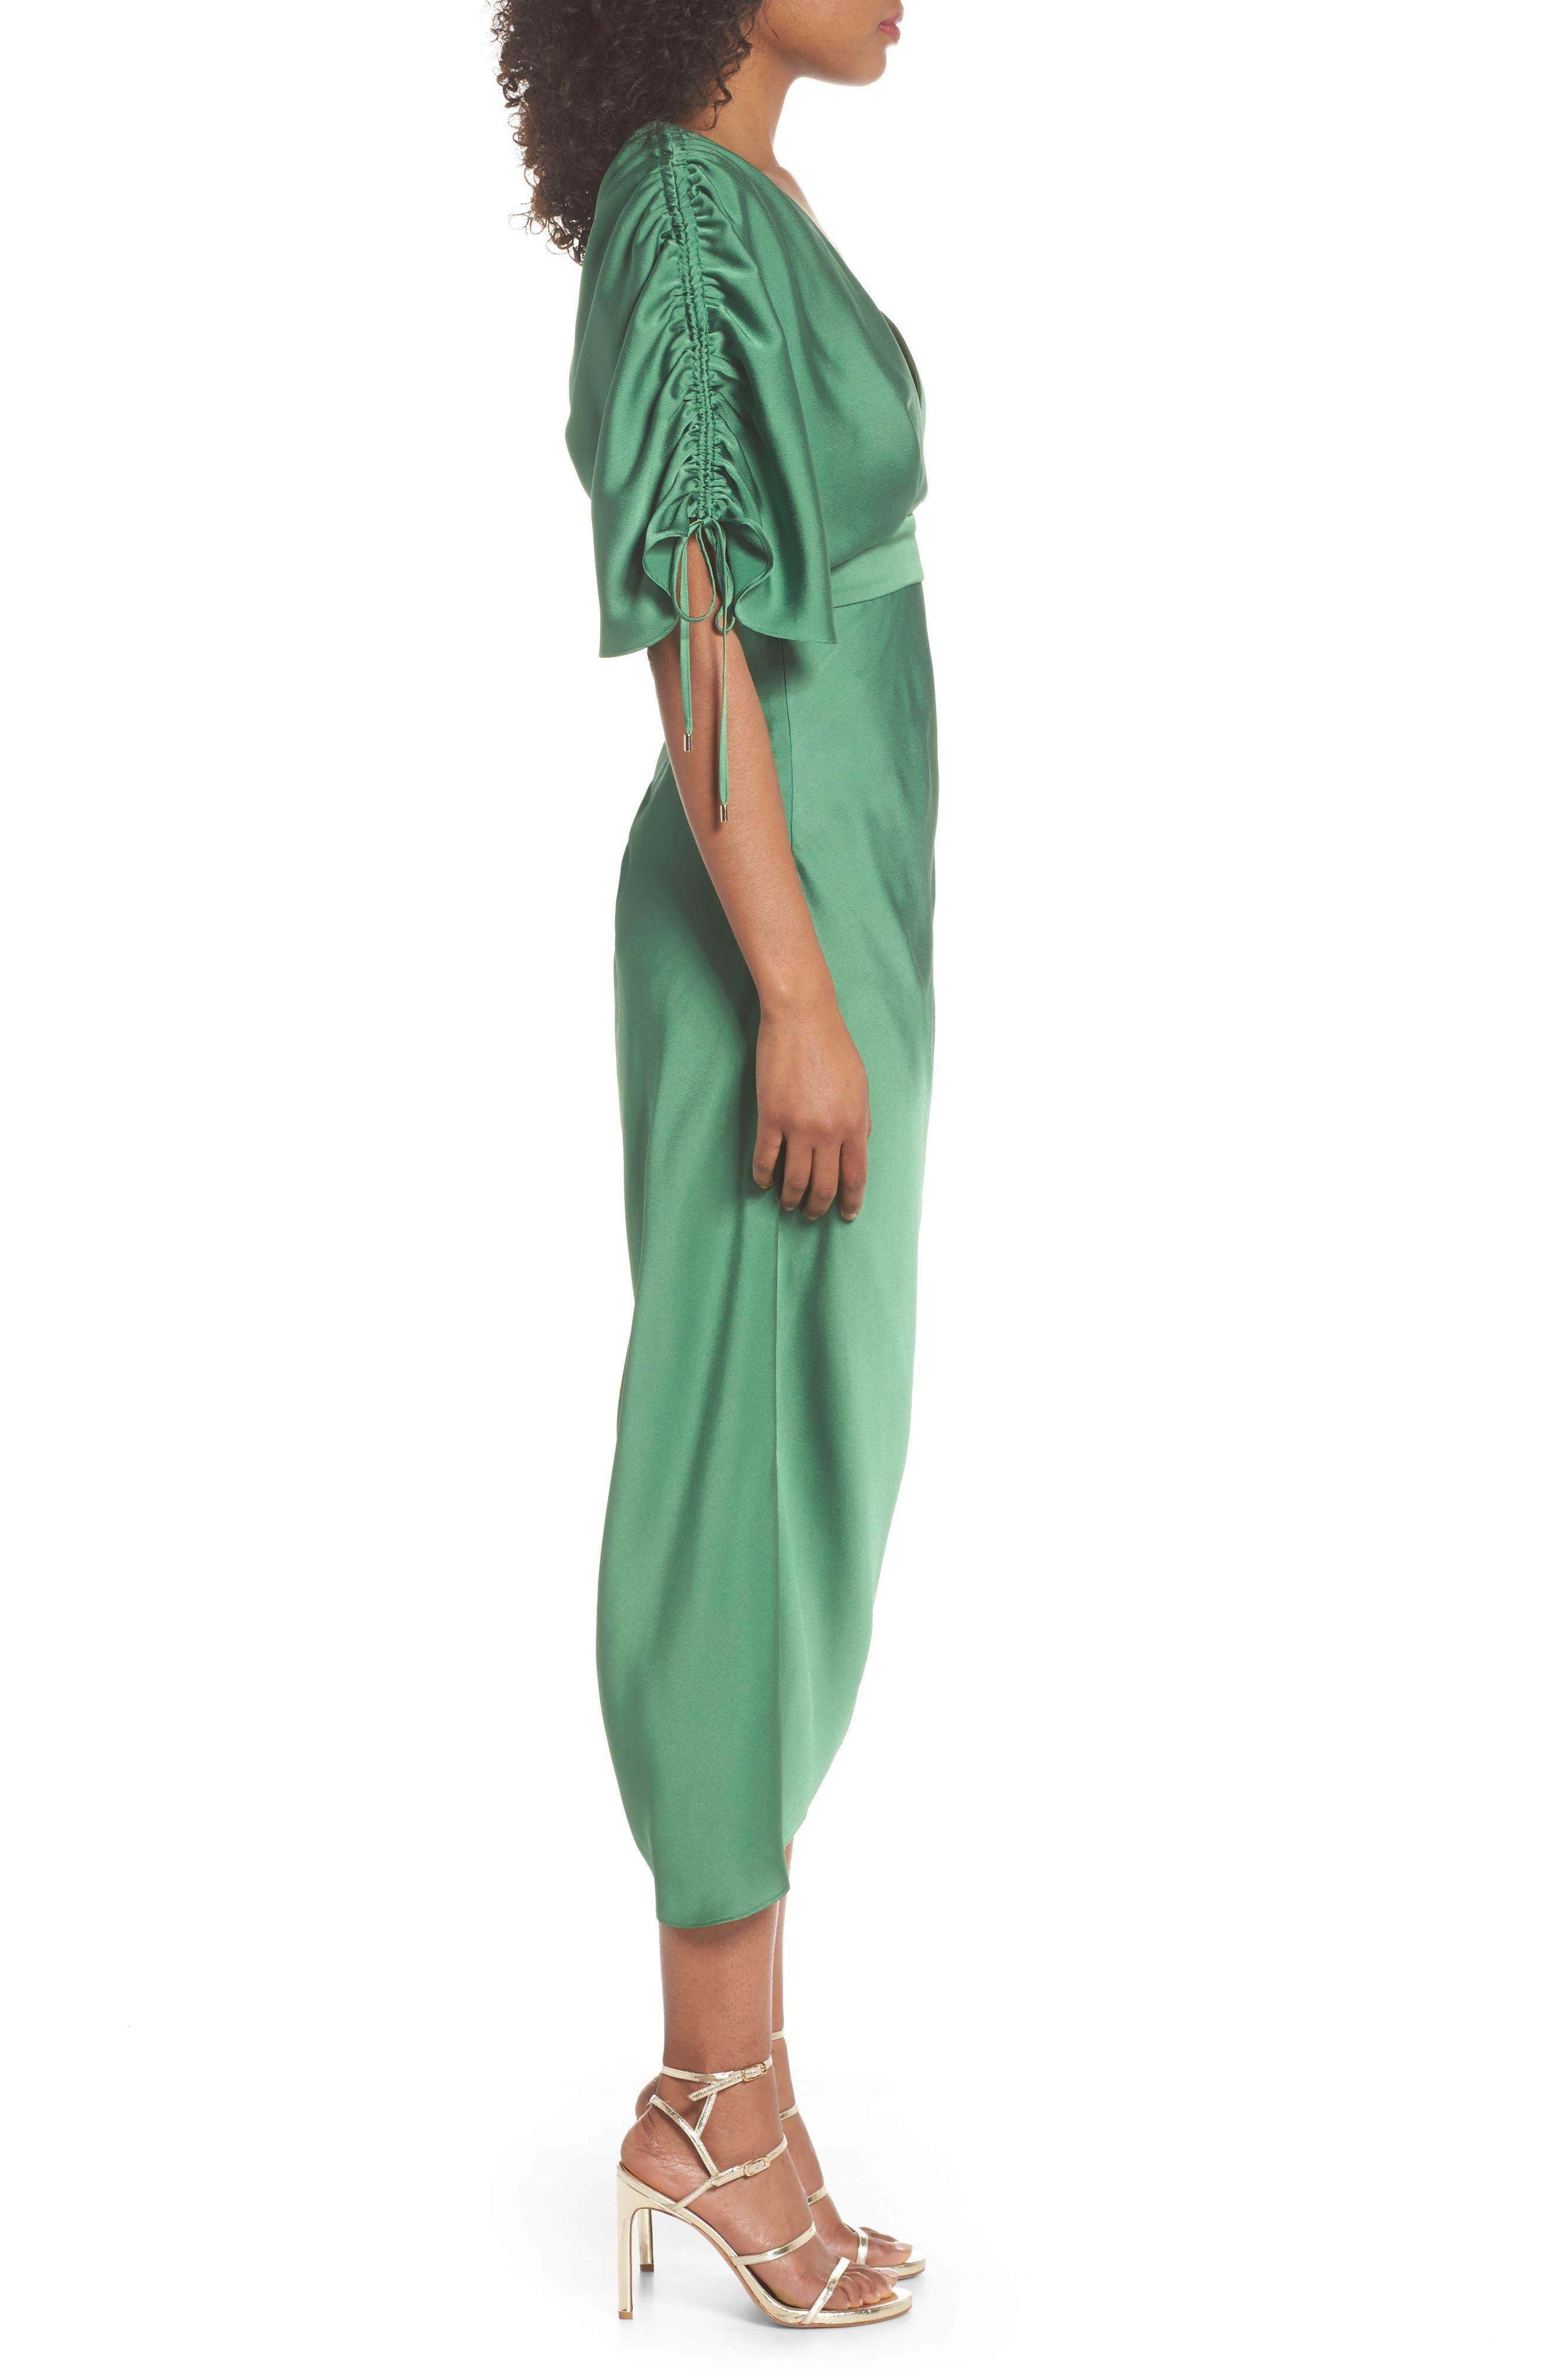 I've Got You Asymmetrical Satin Dress,                             Alternate thumbnail 3, color,                             Emerald Green